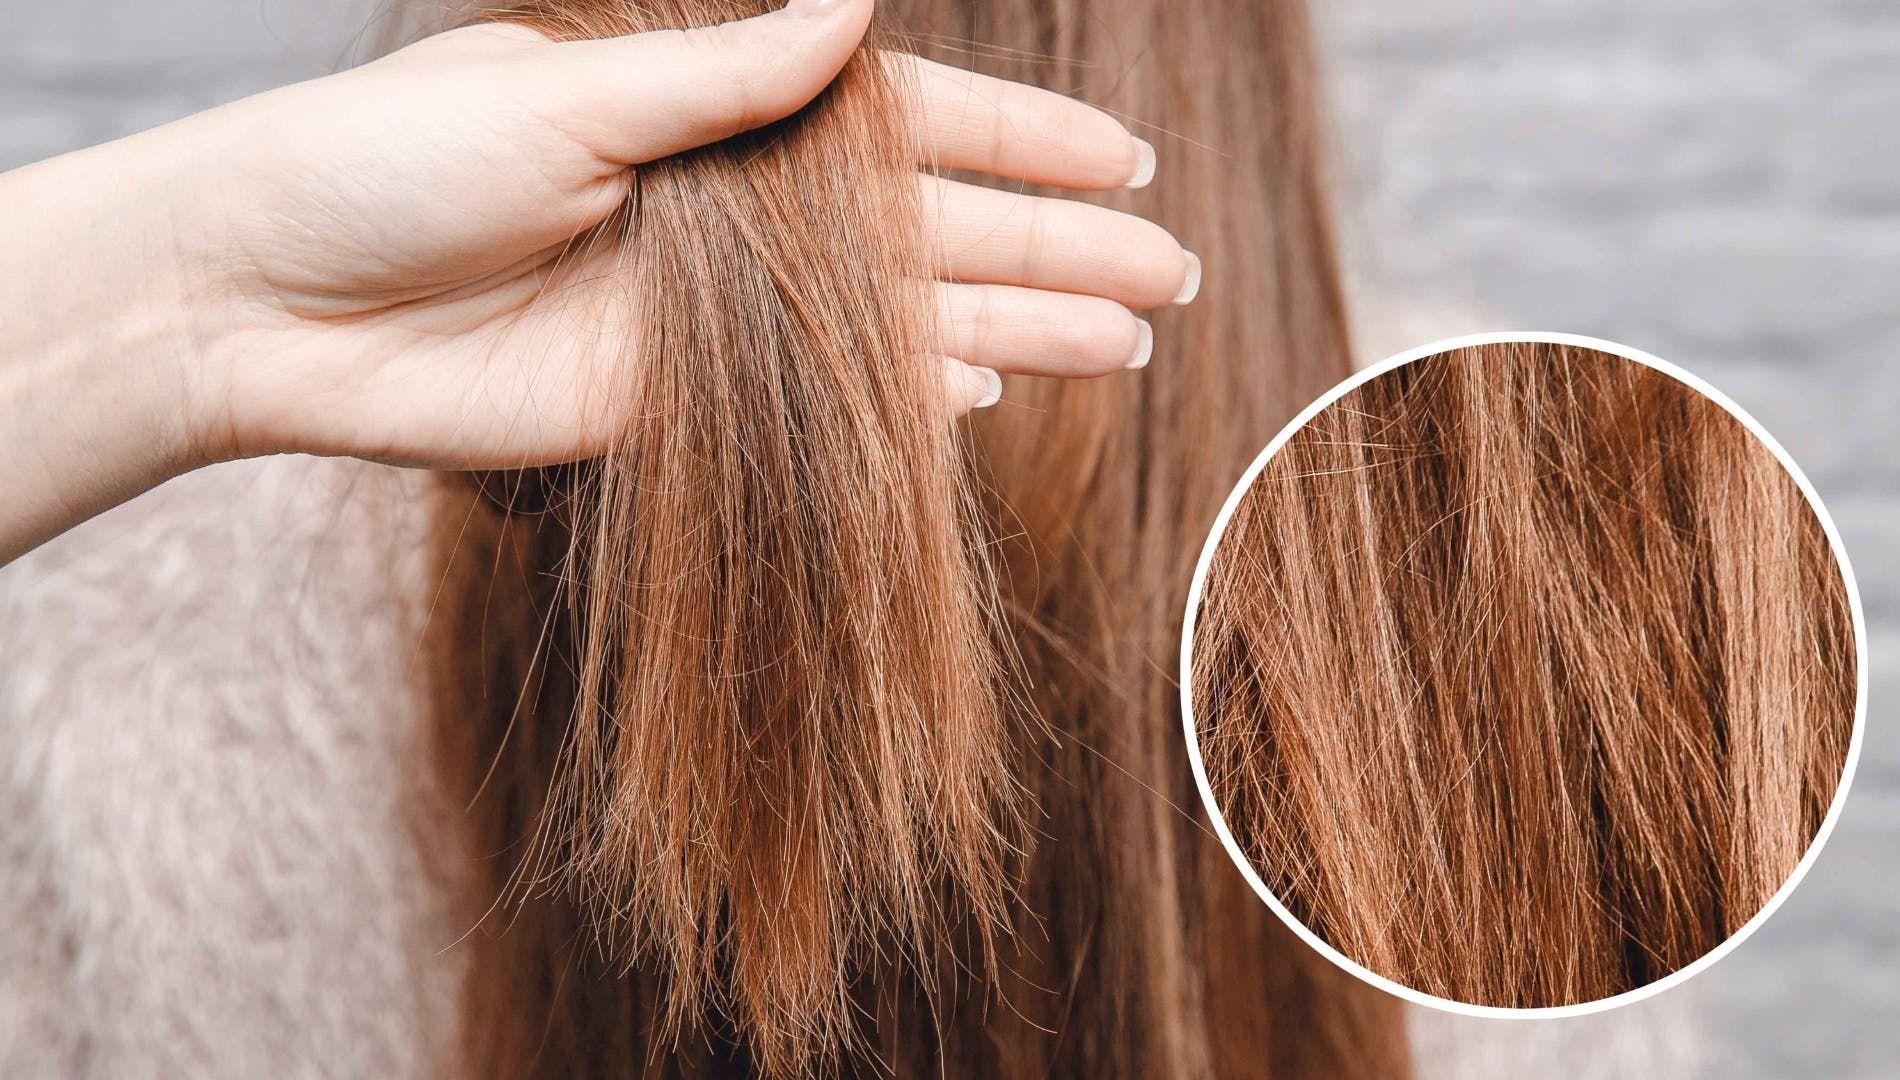 طريقة فعالة لعلاج الشعر التالف Hair Repair Treatments Stop Hair Breakage Hair Repair